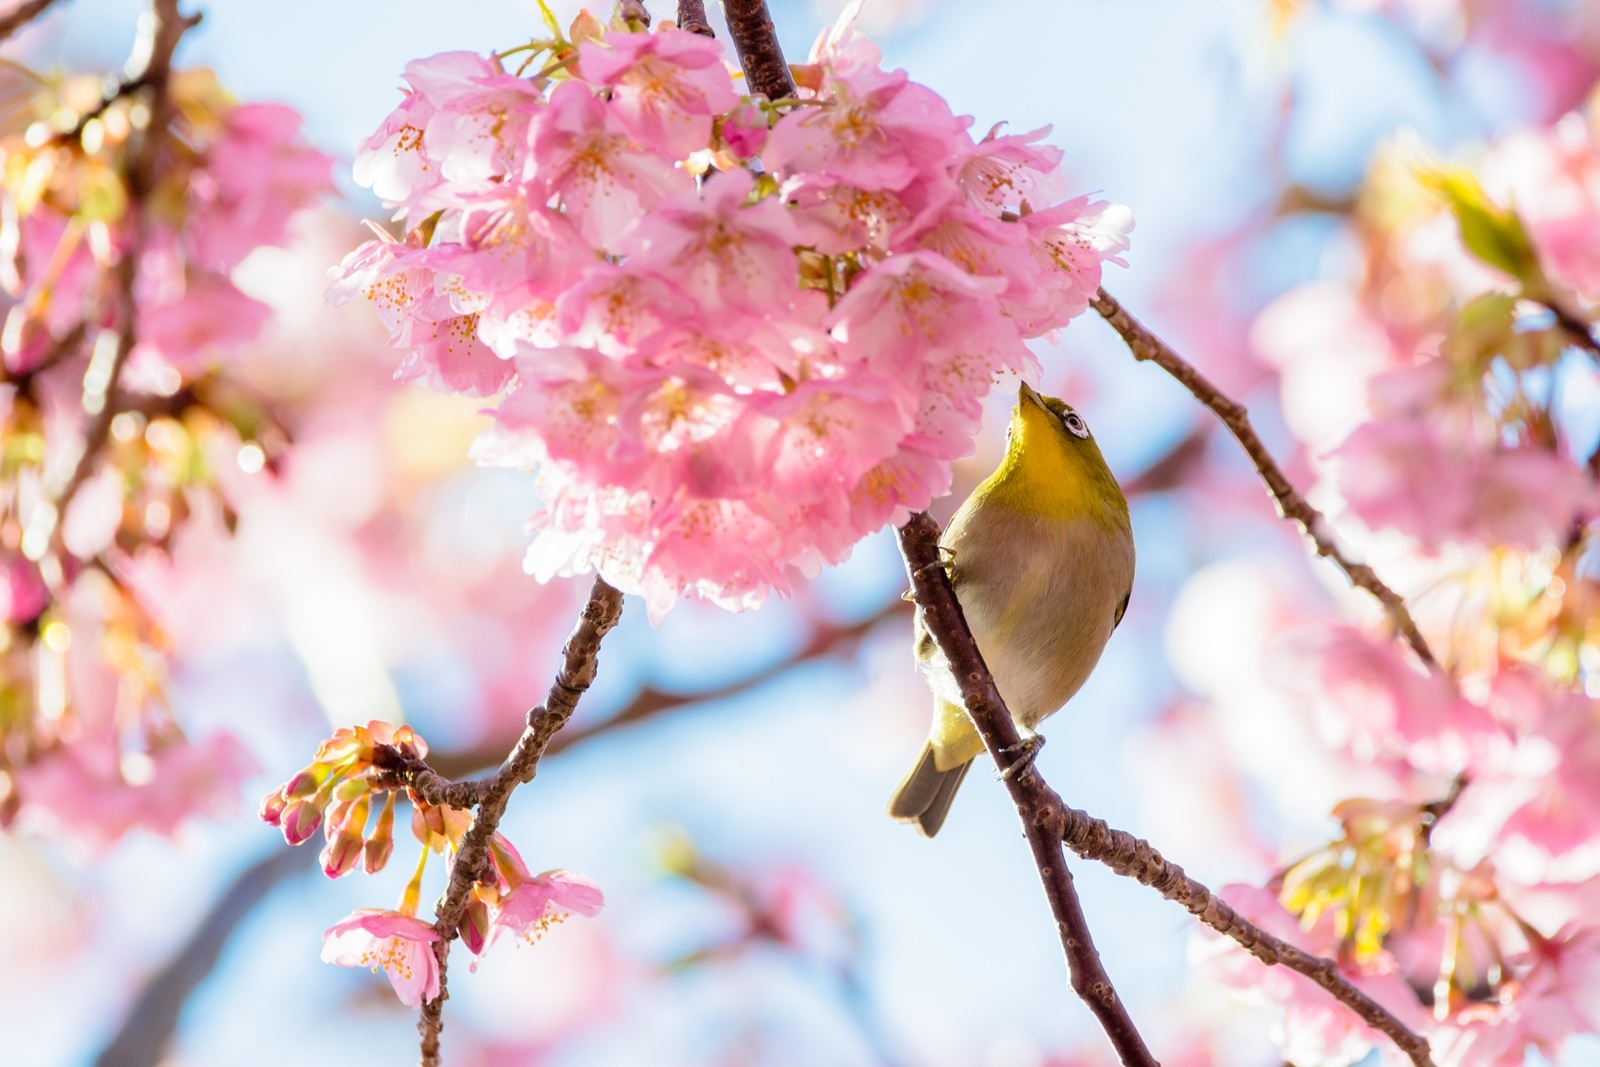 Photo: 「春に夢中」 / Crazy for spring.  高鳴る気持ち 好きで好きで 止まらない 春が駆け抜けていく  Japanese White-eye. (メジロ)  Nikon D7200 SIGMA 150-600mm F5-6.3 DG OS HSM Contemporary  #birdphotography #birds #kawaii #nikon #sigma #小鳥グラファー  ( http://takafumiooshio.com/archives/965 )